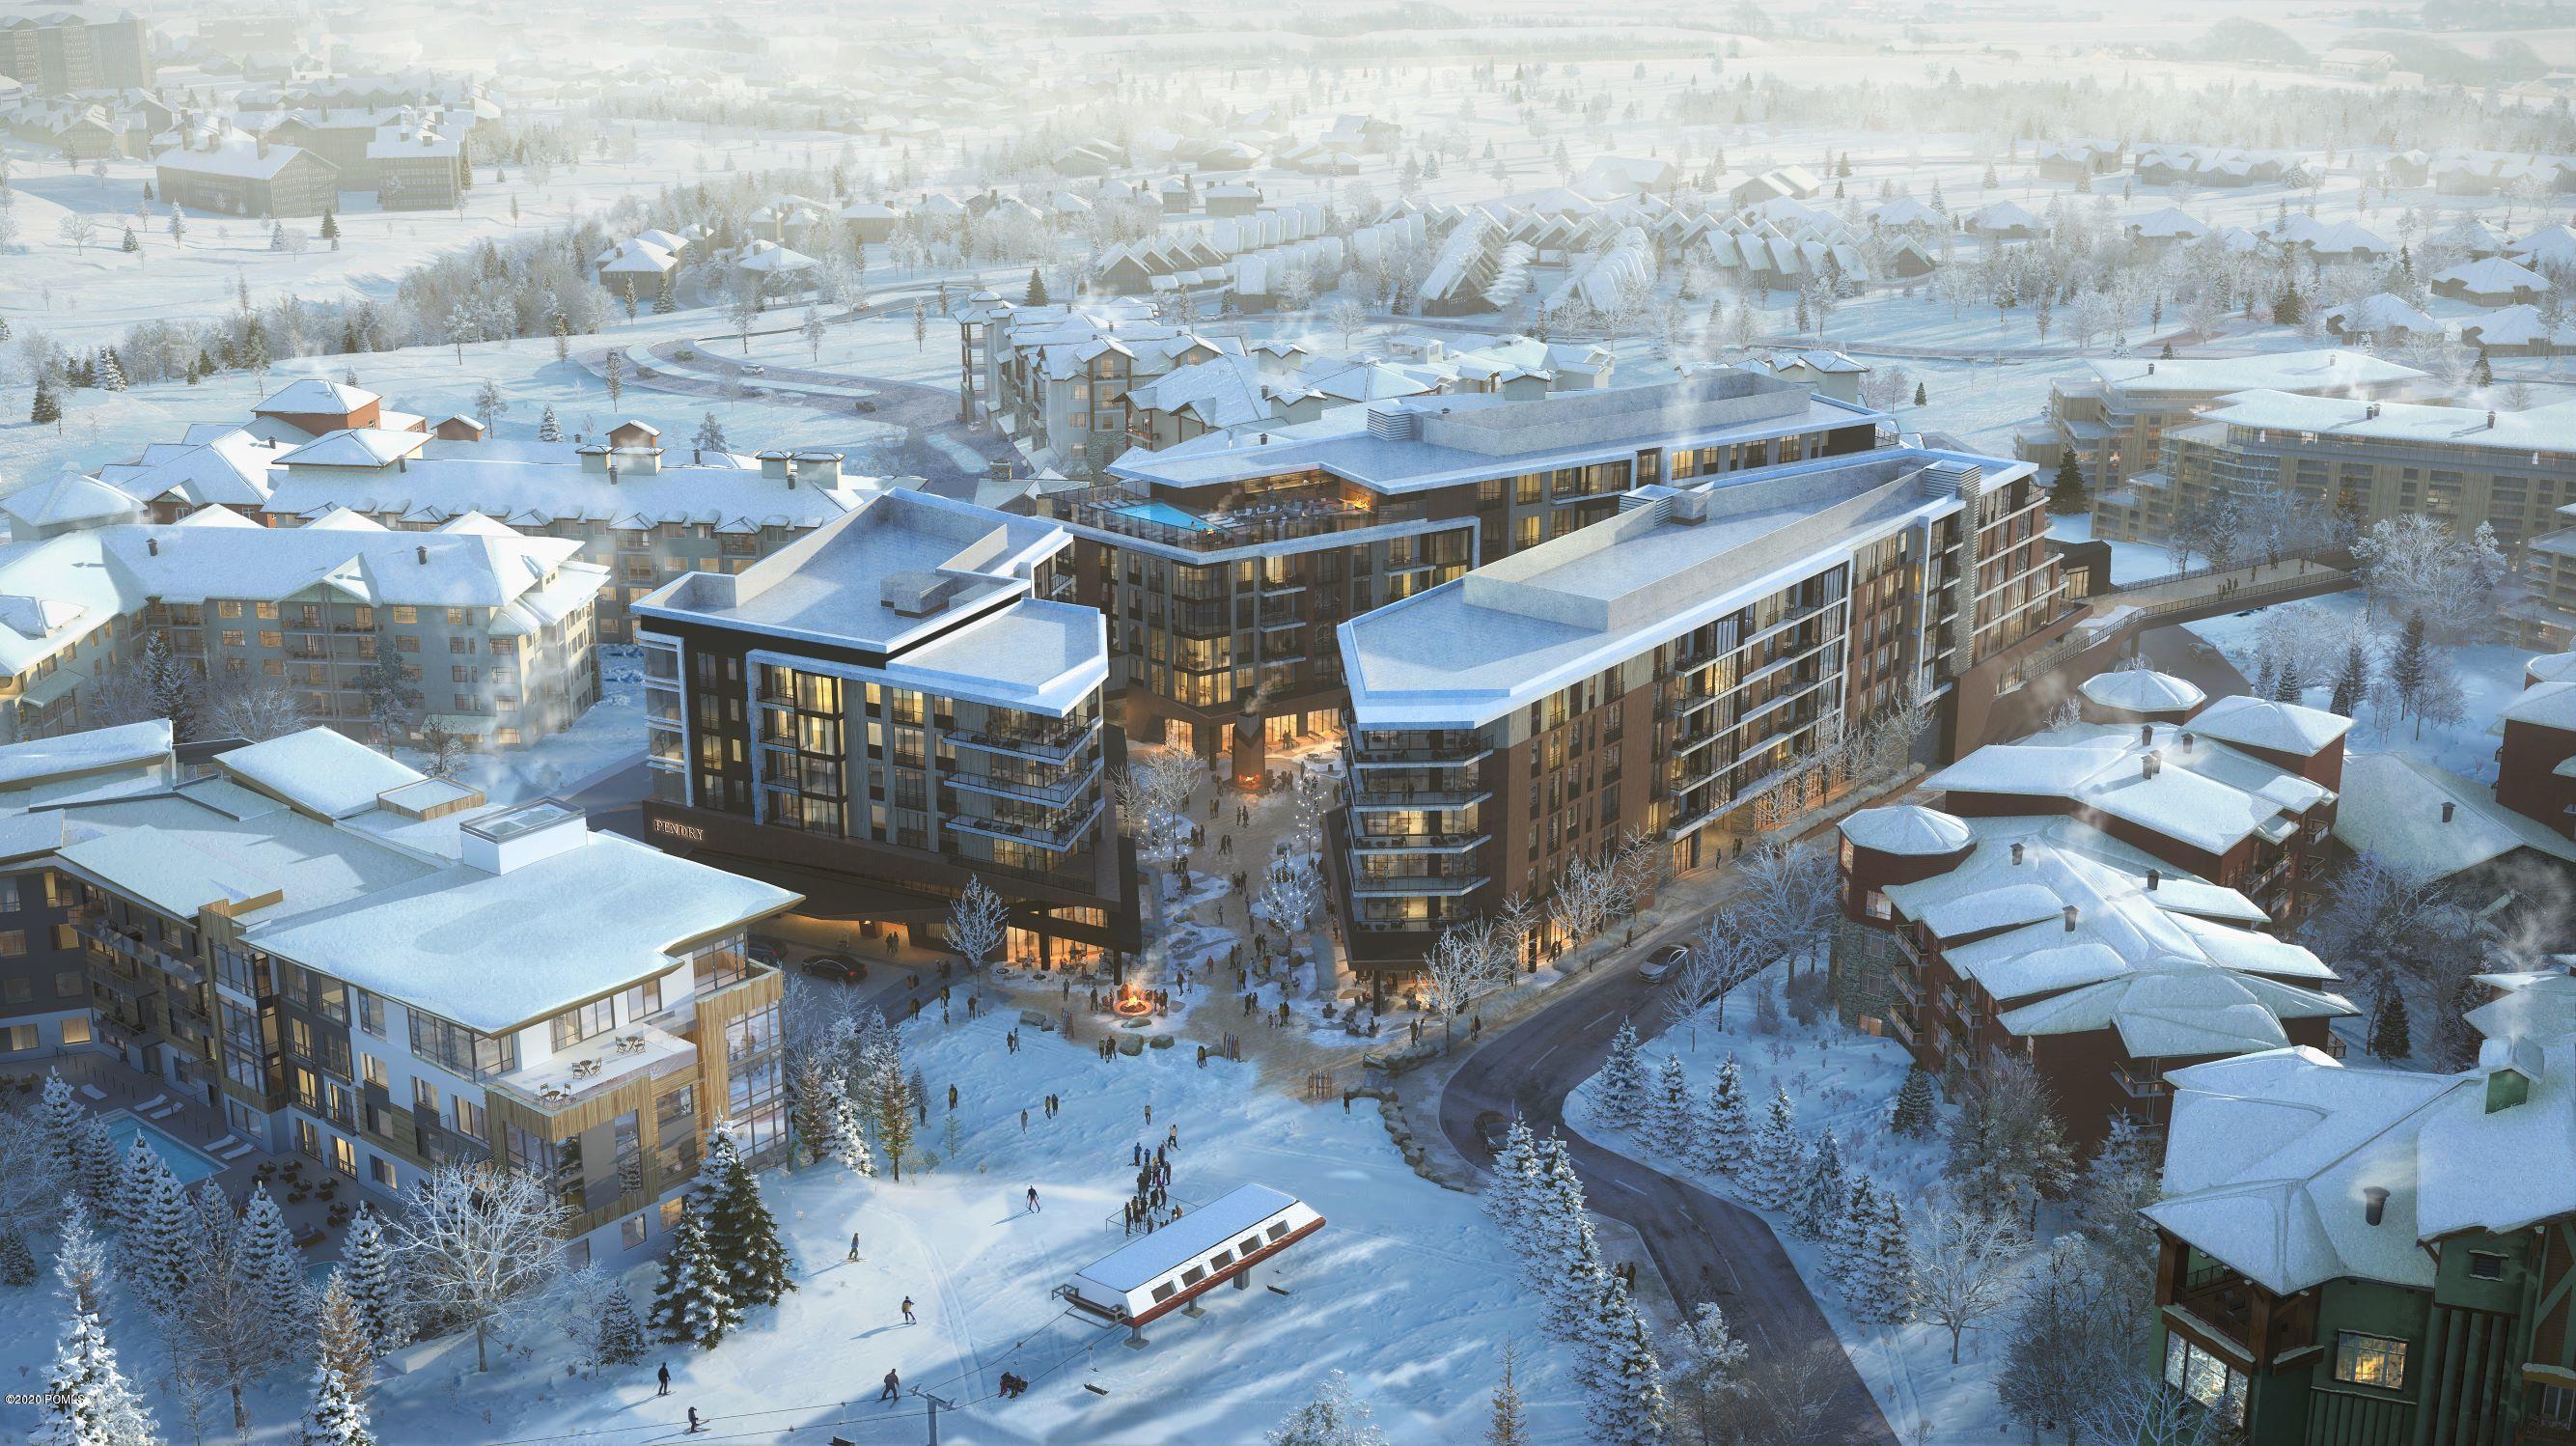 2417 High Mountain Road, Park City, Utah 84060, 3 Bedrooms Bedrooms, ,3 BathroomsBathrooms,Condominium,For Sale,High Mountain,12004358